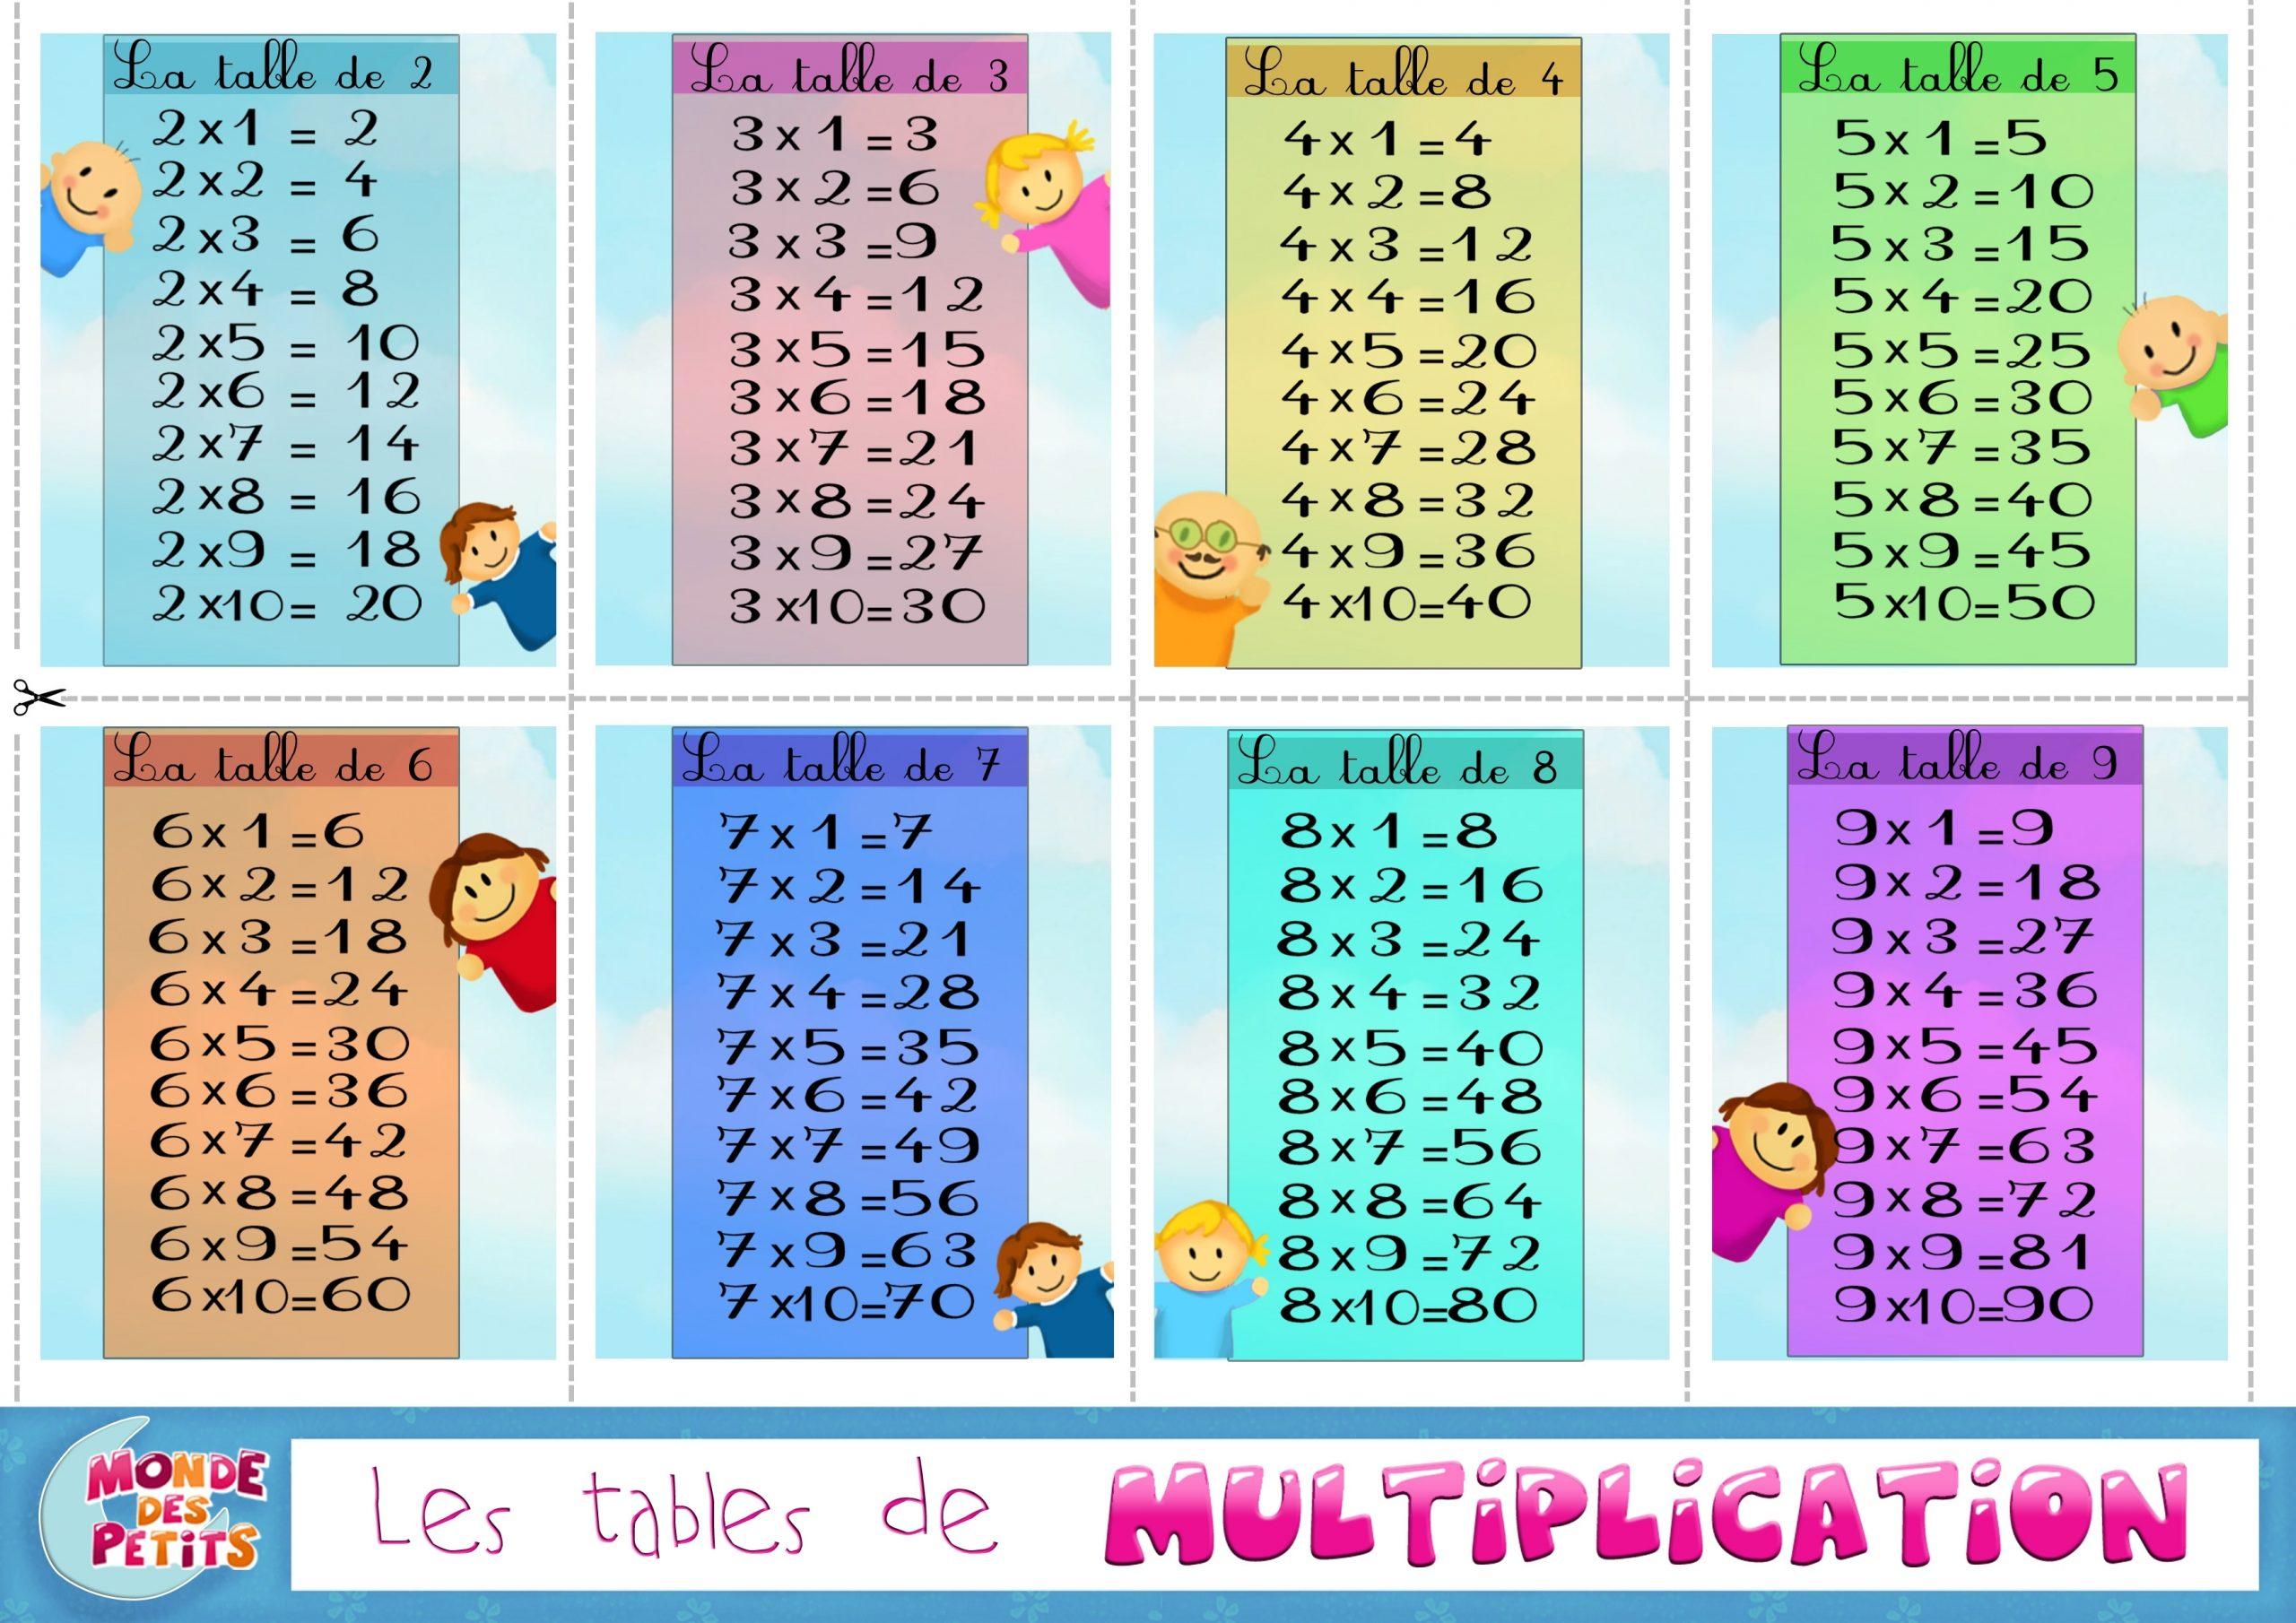 Take Table Multiplication A Imprimer Gratuitement